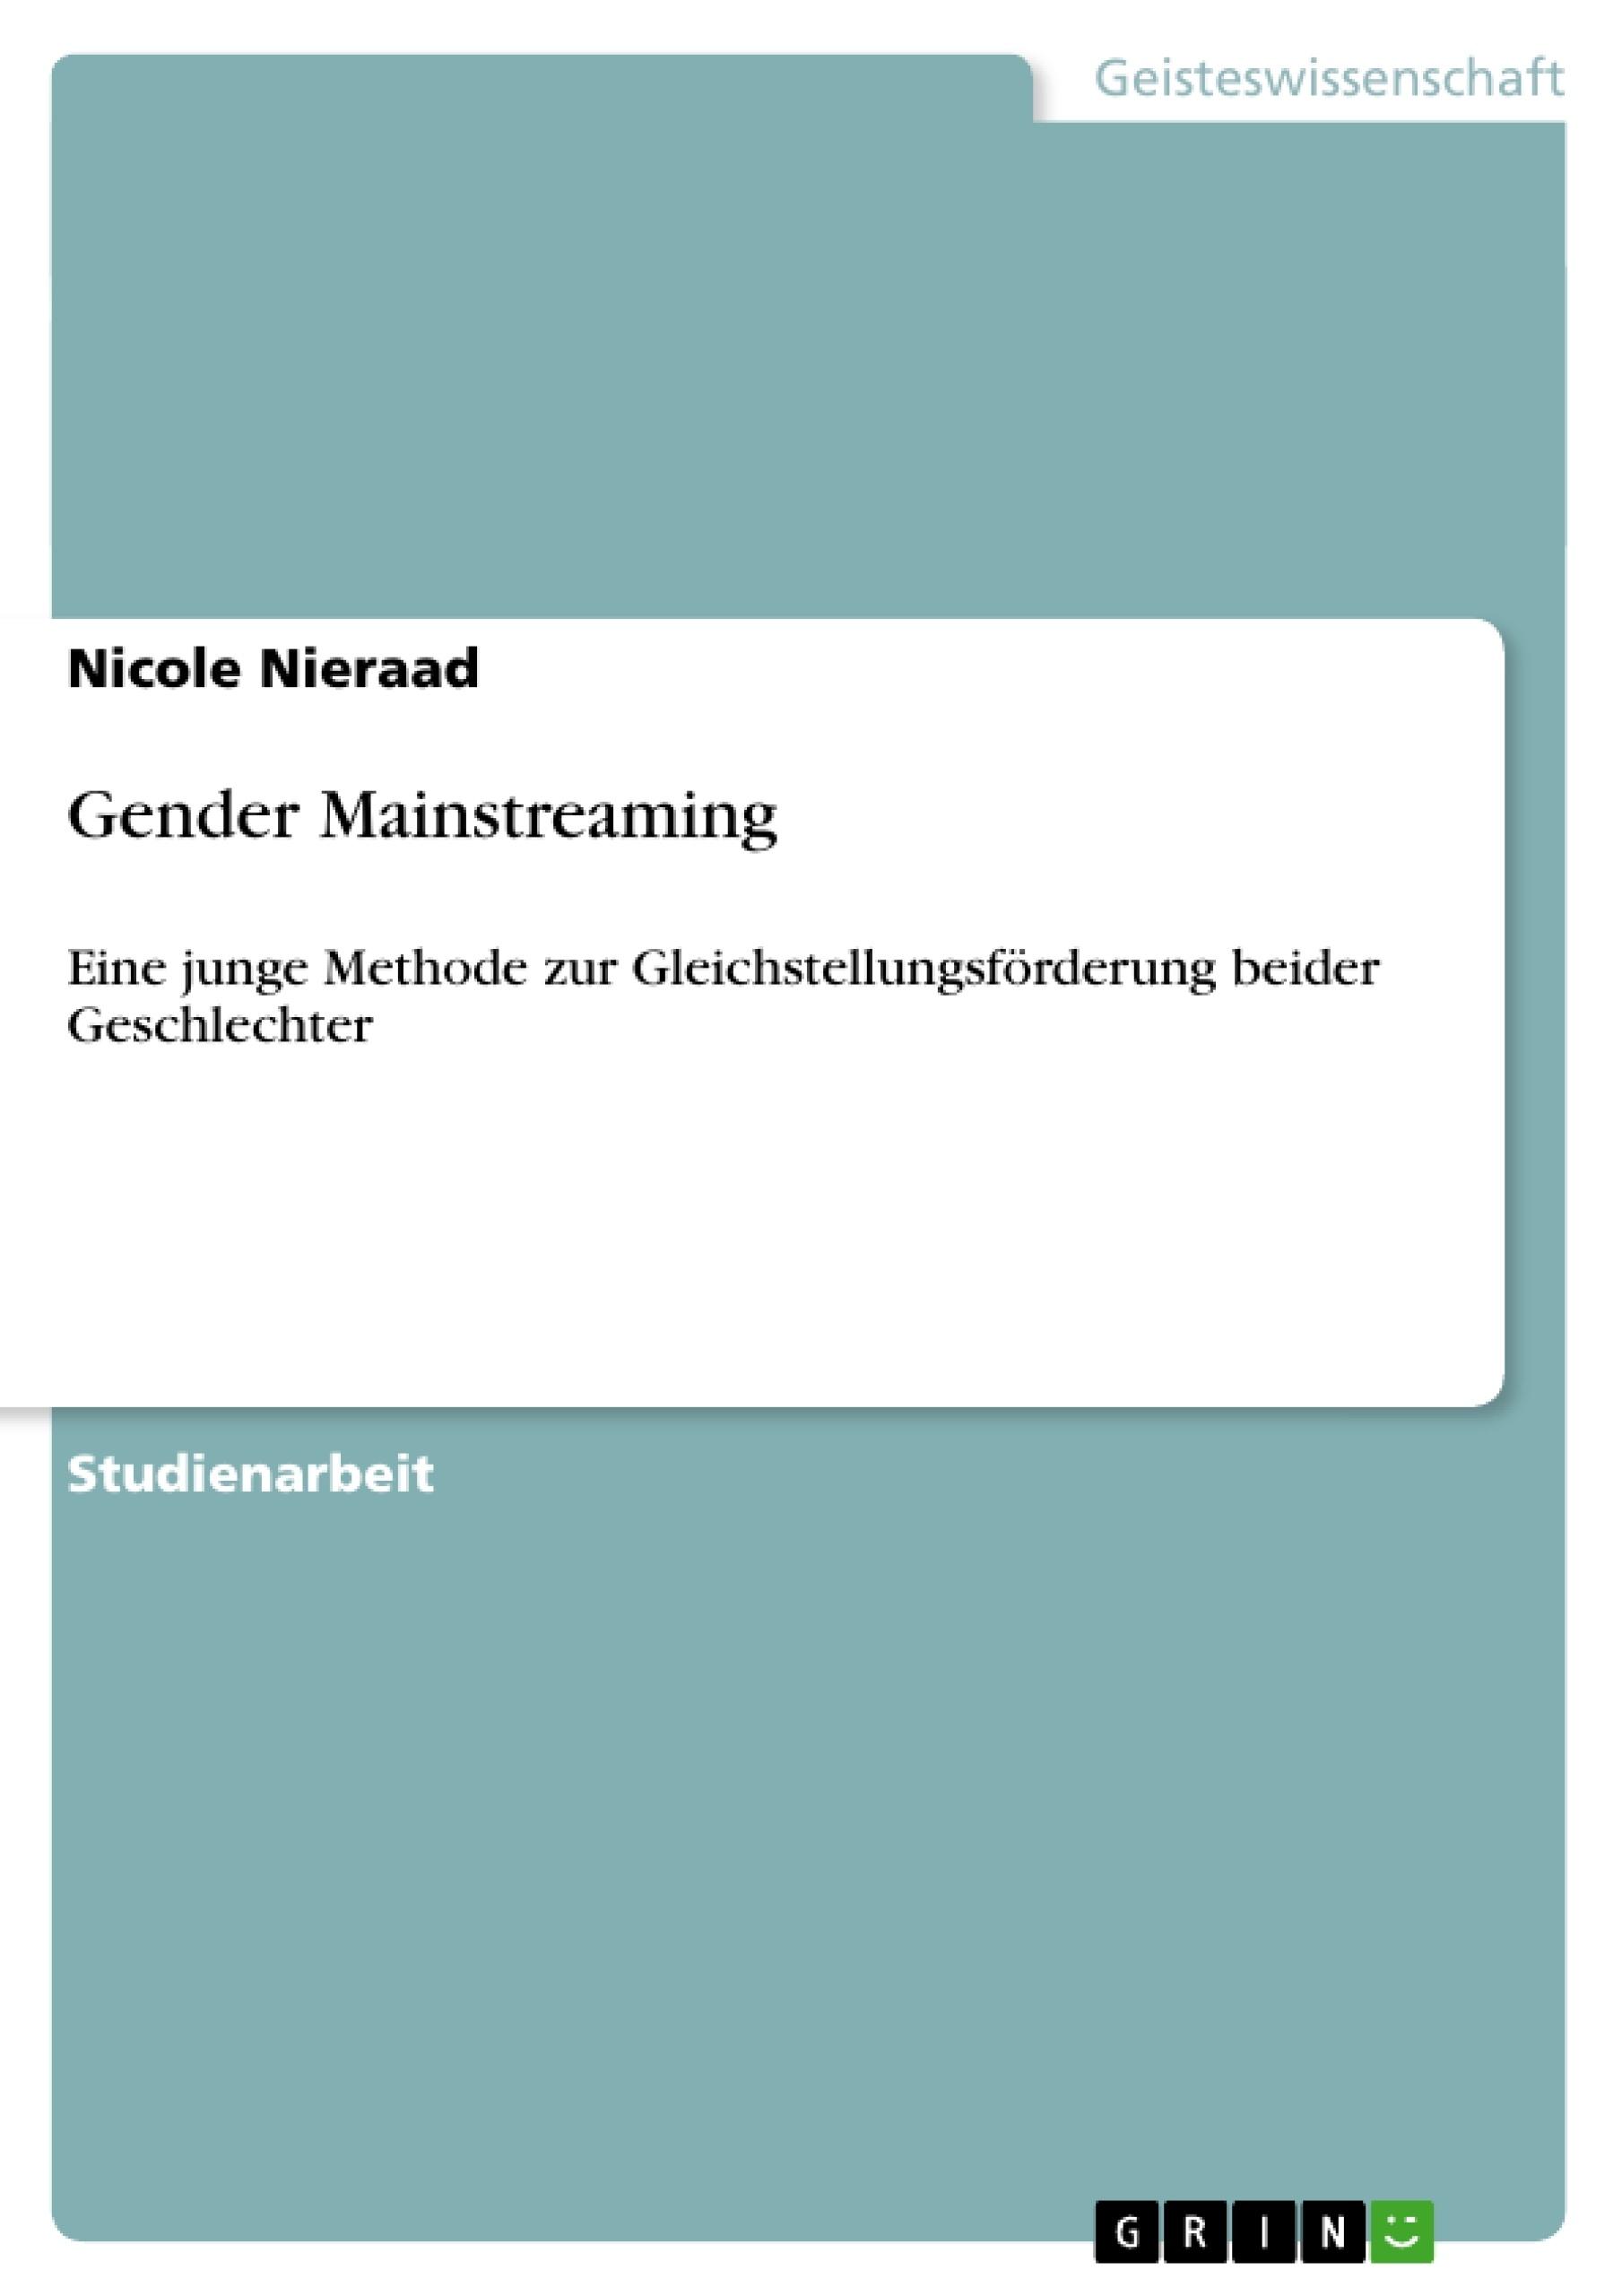 Titel: Gender Mainstreaming